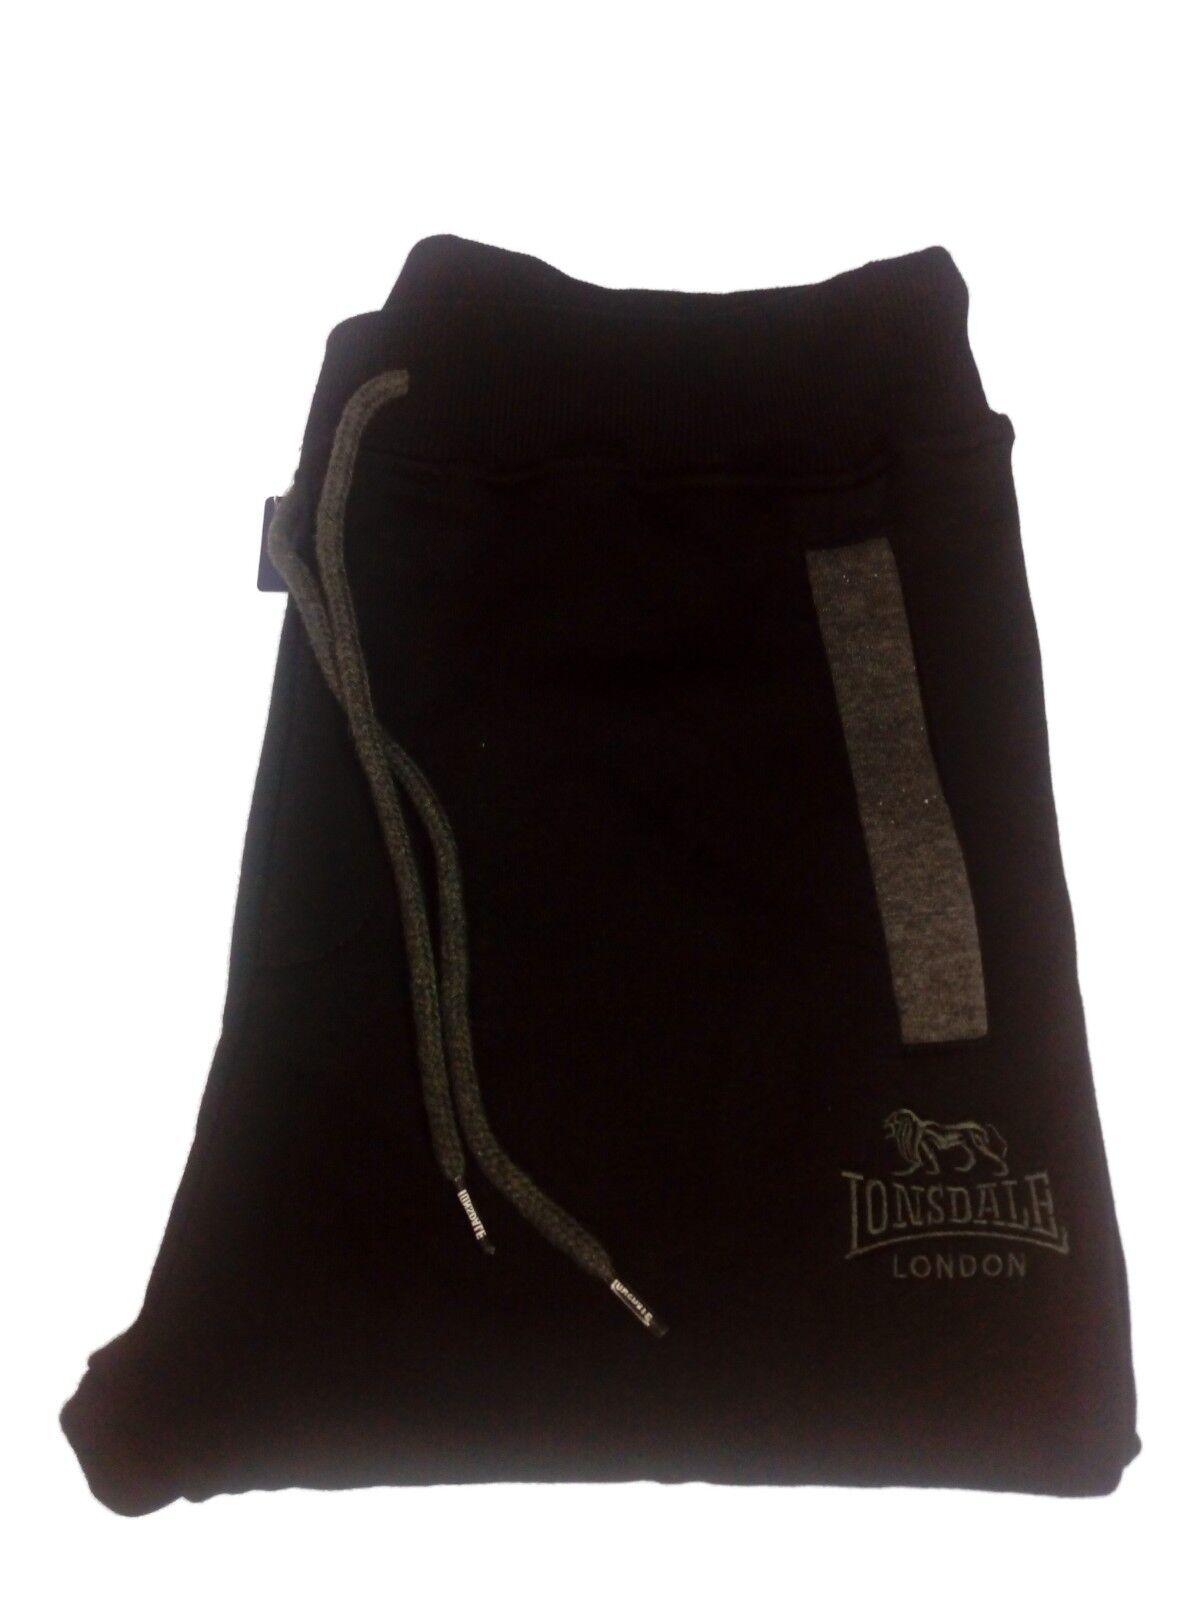 Pantaloni di Tuta men LONSDALE Invernale in Cotone Feloato black tg L